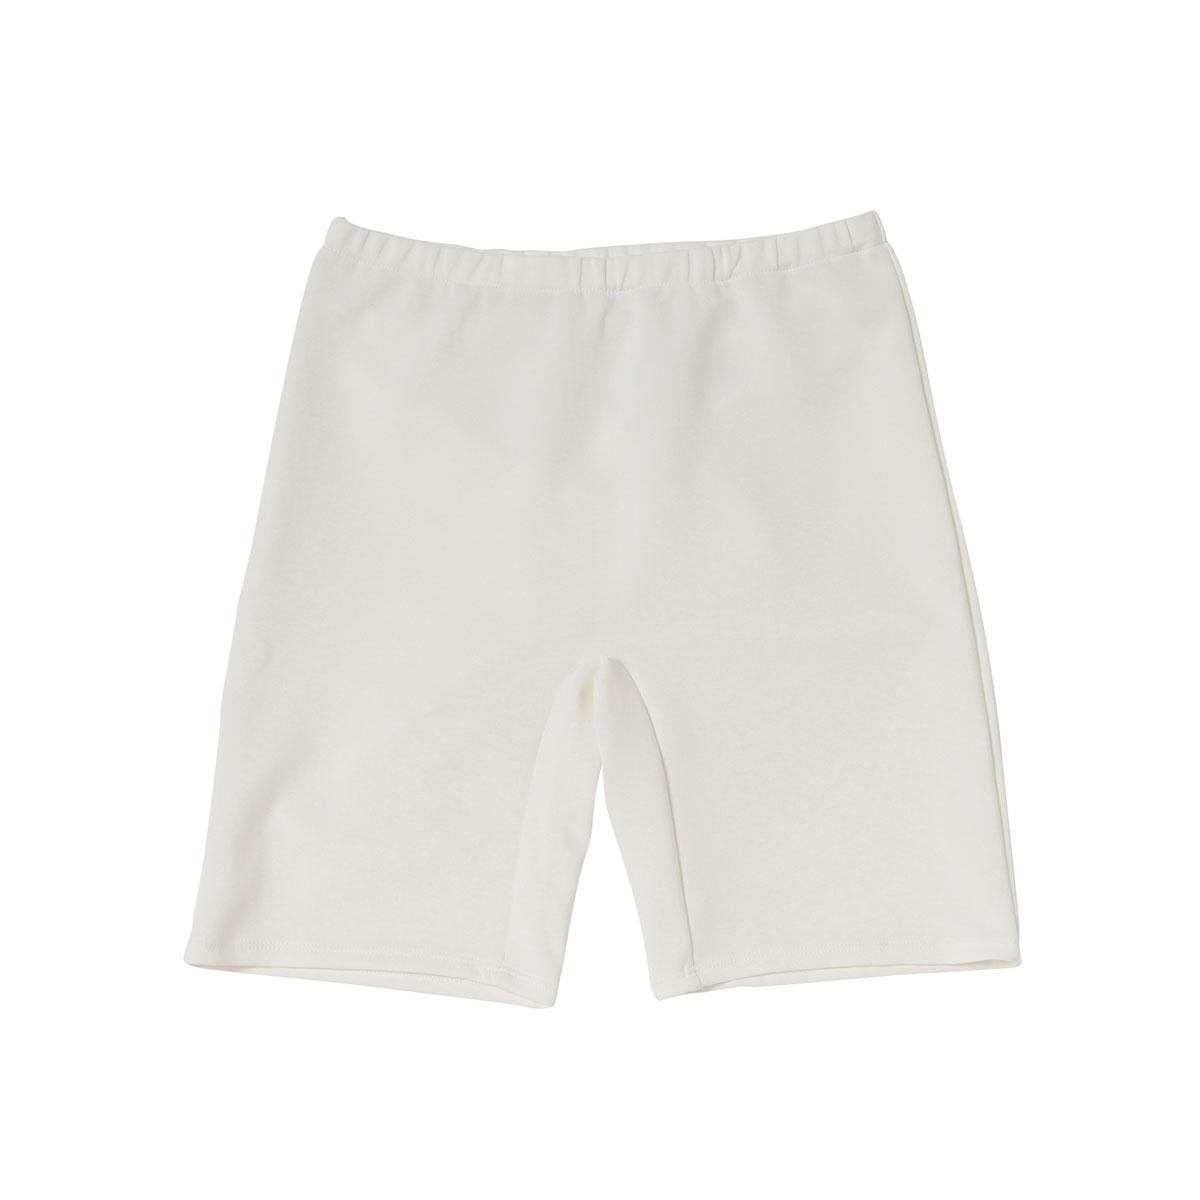 GUACAMOLE GUACAmos SPATS(ガカモレ ガカモス スパッツ)WHITE【レディース 水着】19SS-S